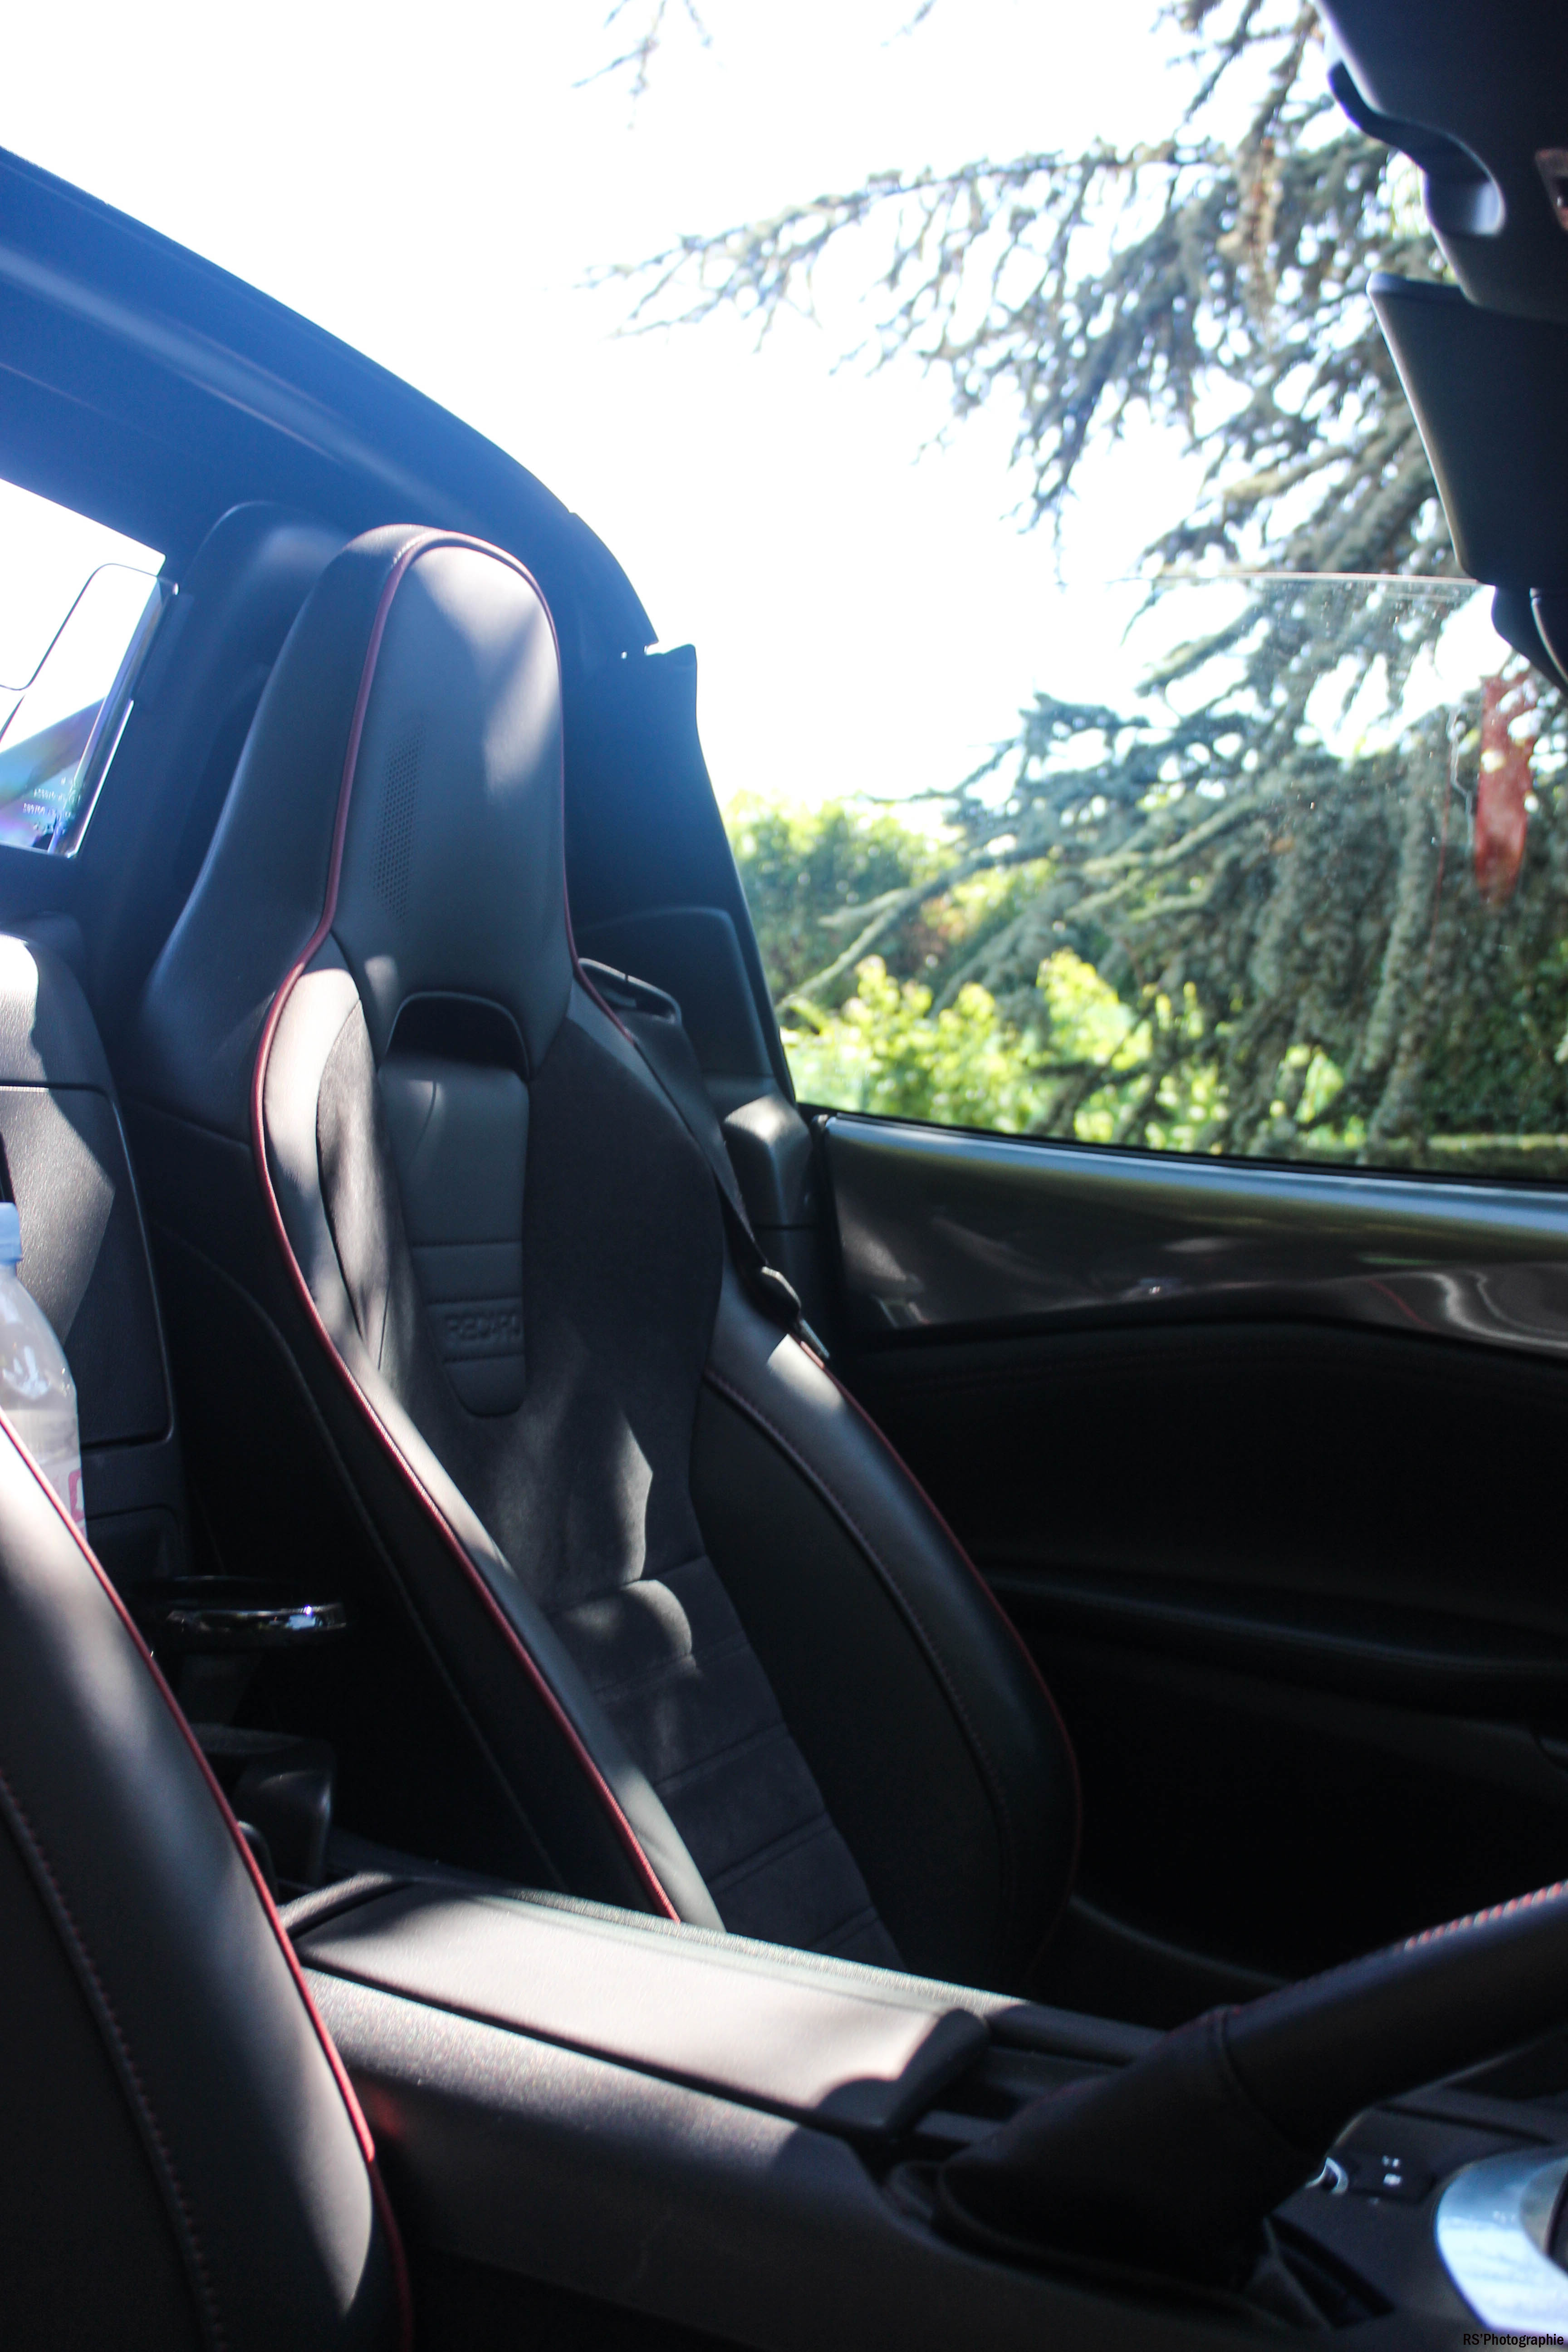 MazdaMX5RF45-mazda-mx5-rf-edition-intérieur-onboard-arnaud-demasier-RSPhotographie